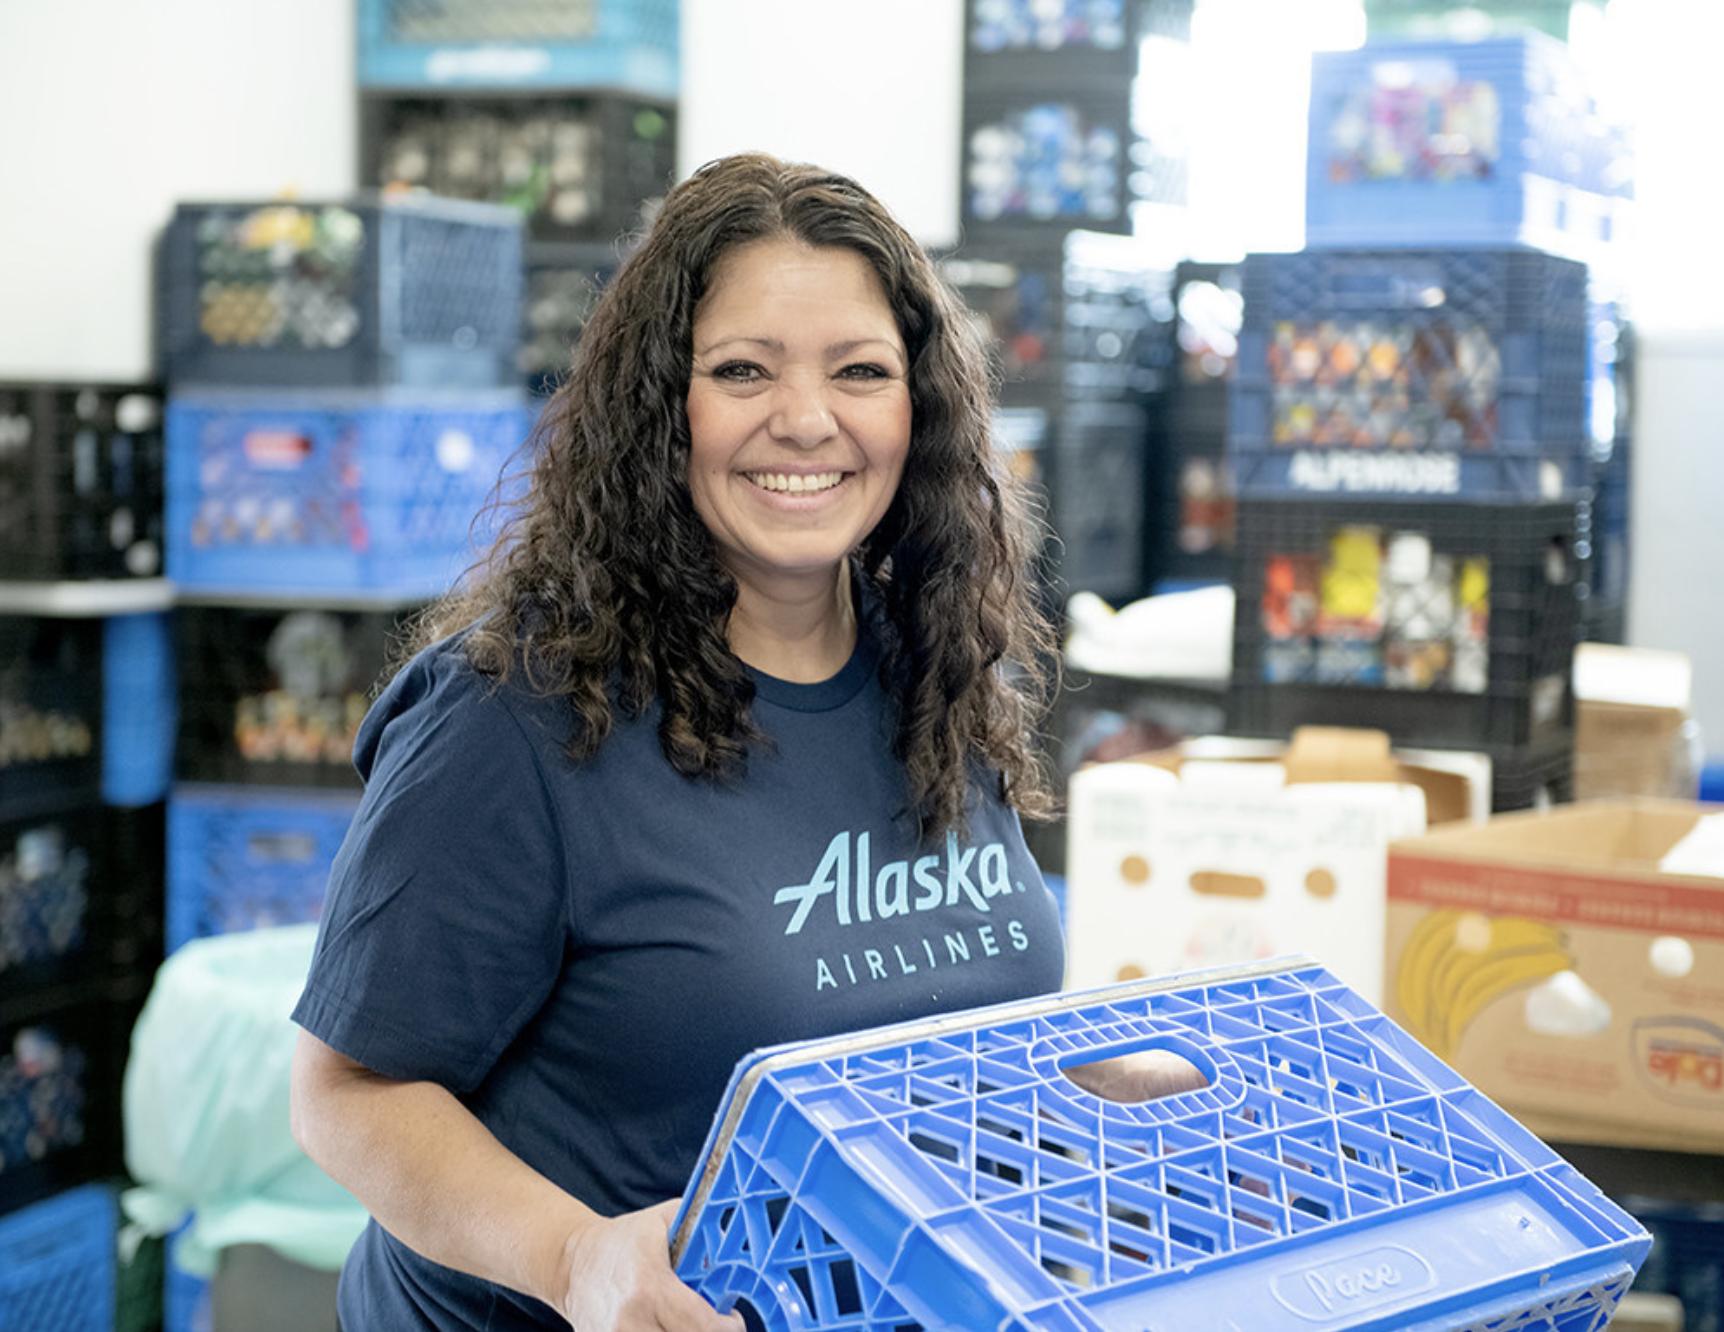 Alaska Airlines #MillionMealsChallenge Reaches Maui Food Bank